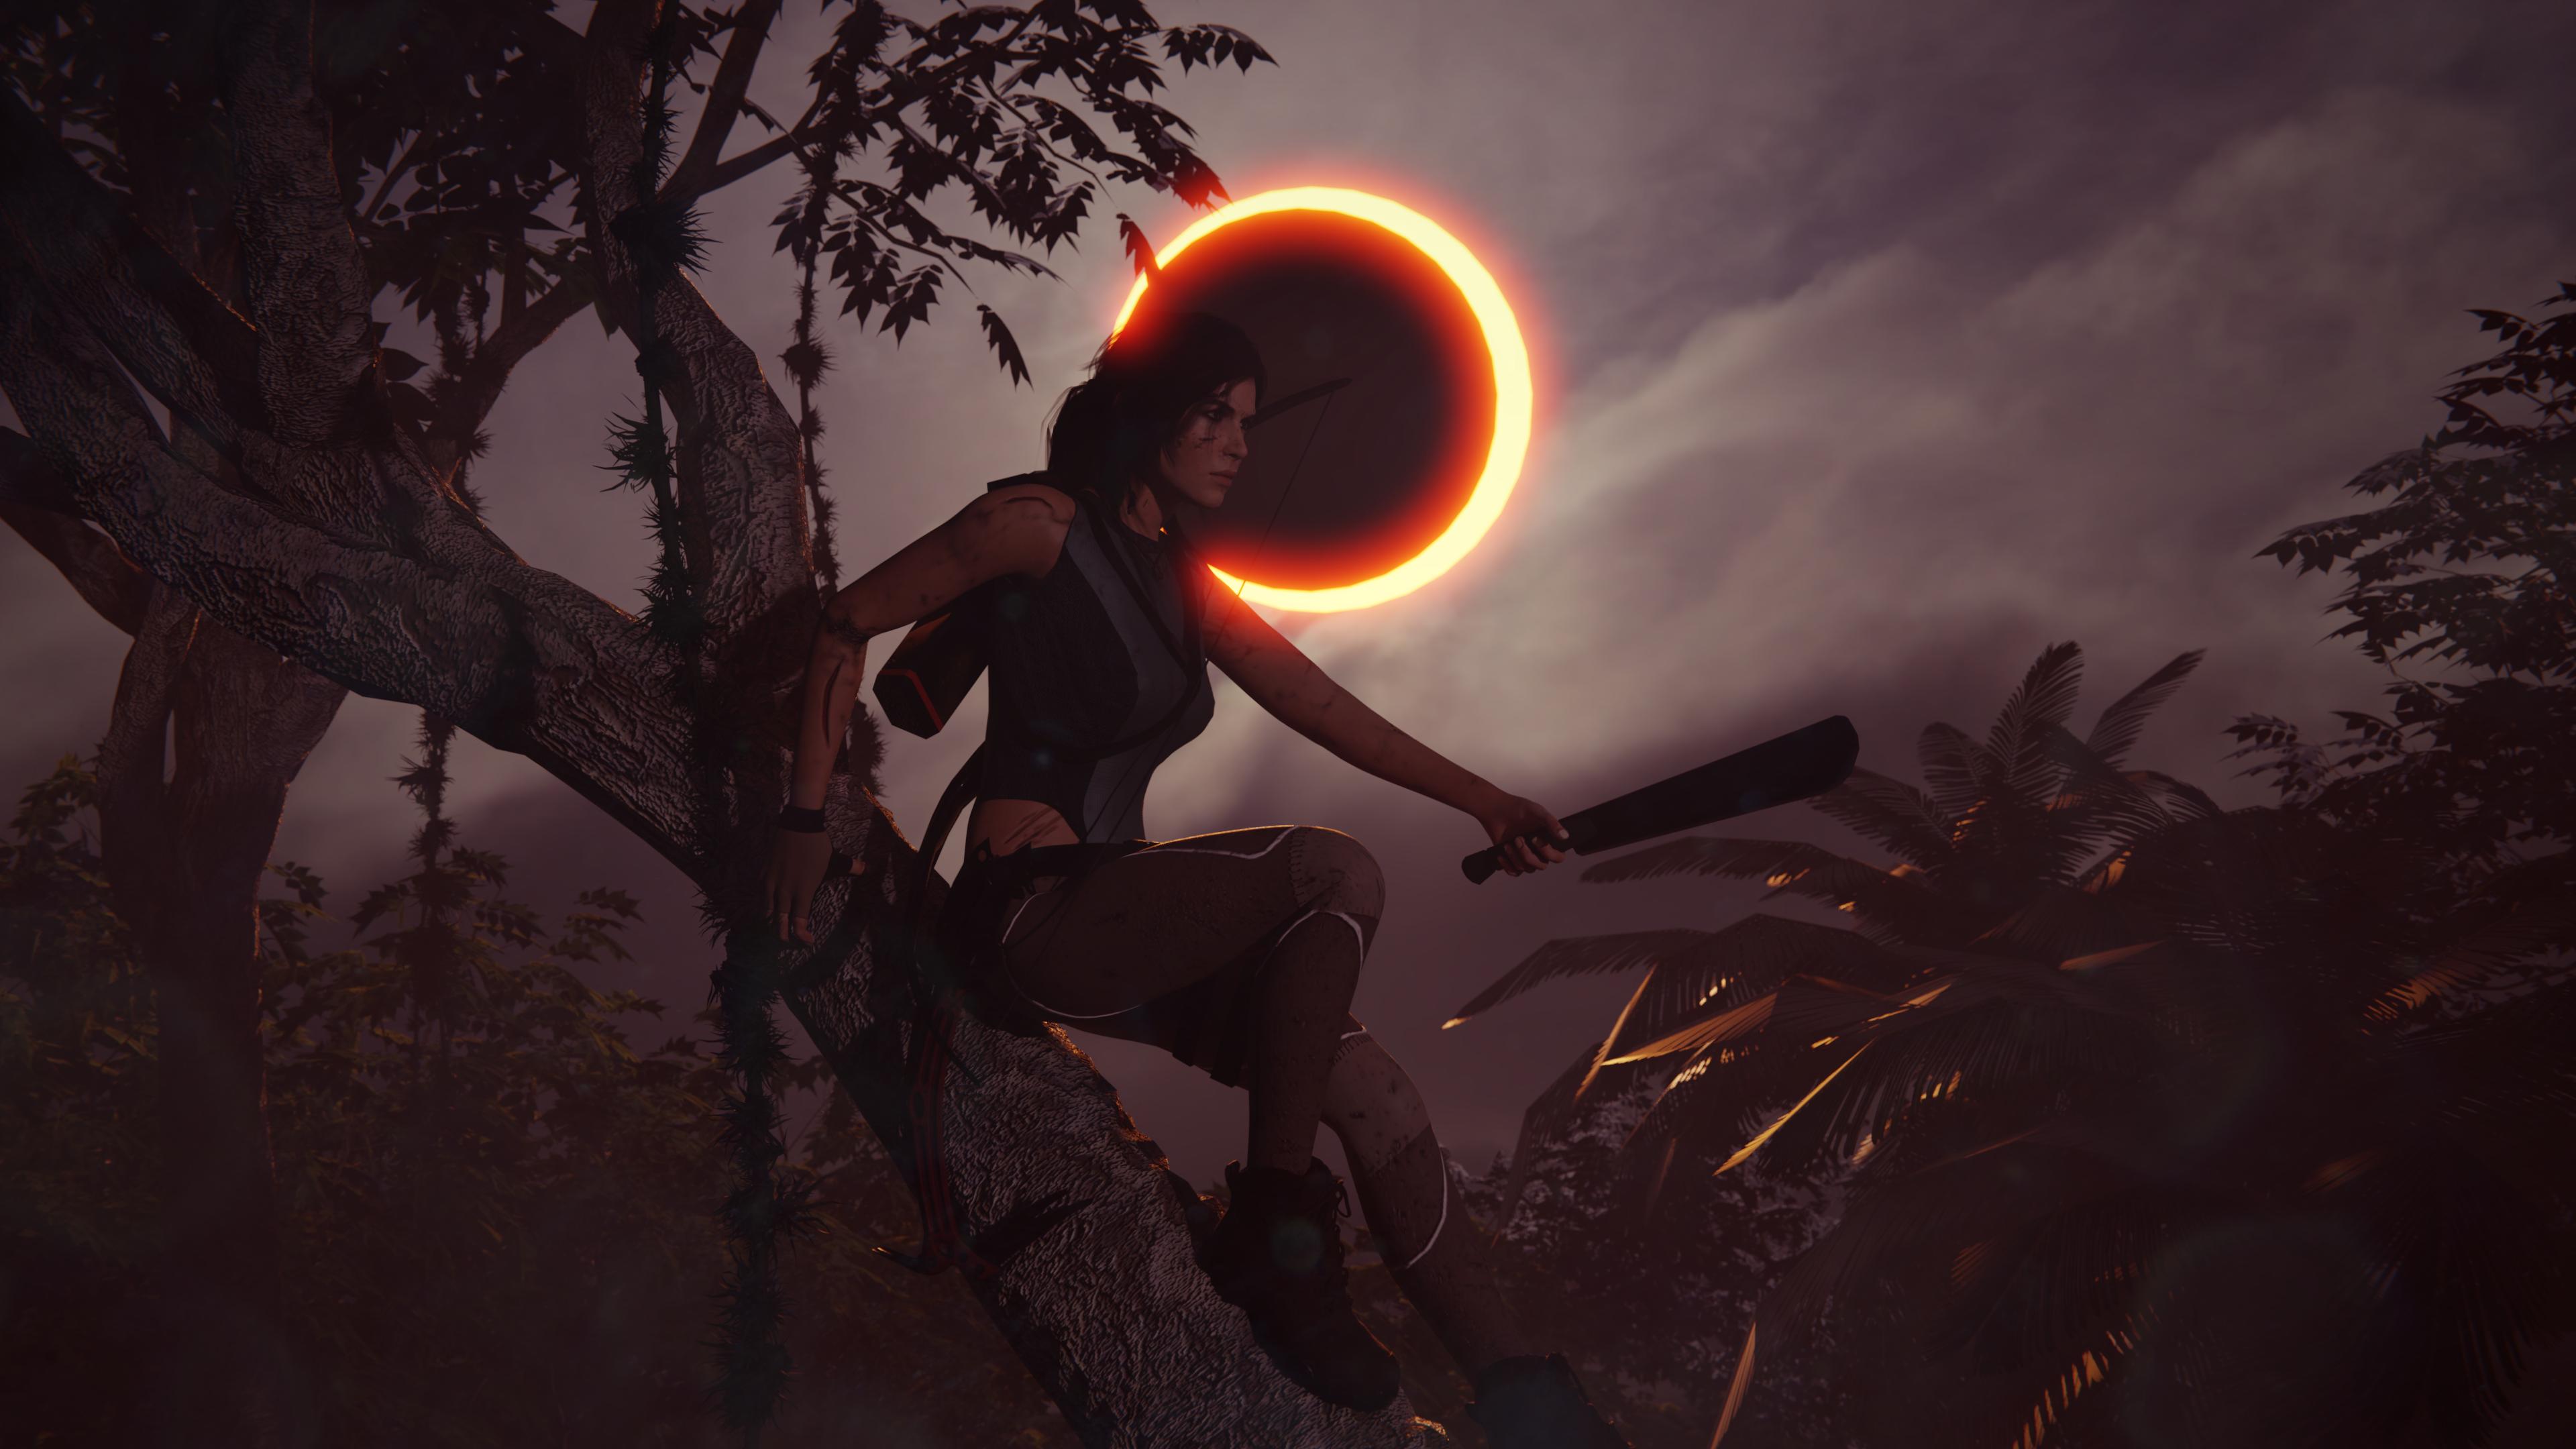 Shadow Of The Tomb Raider Wallpaper 4k By Mandaloking On Deviantart